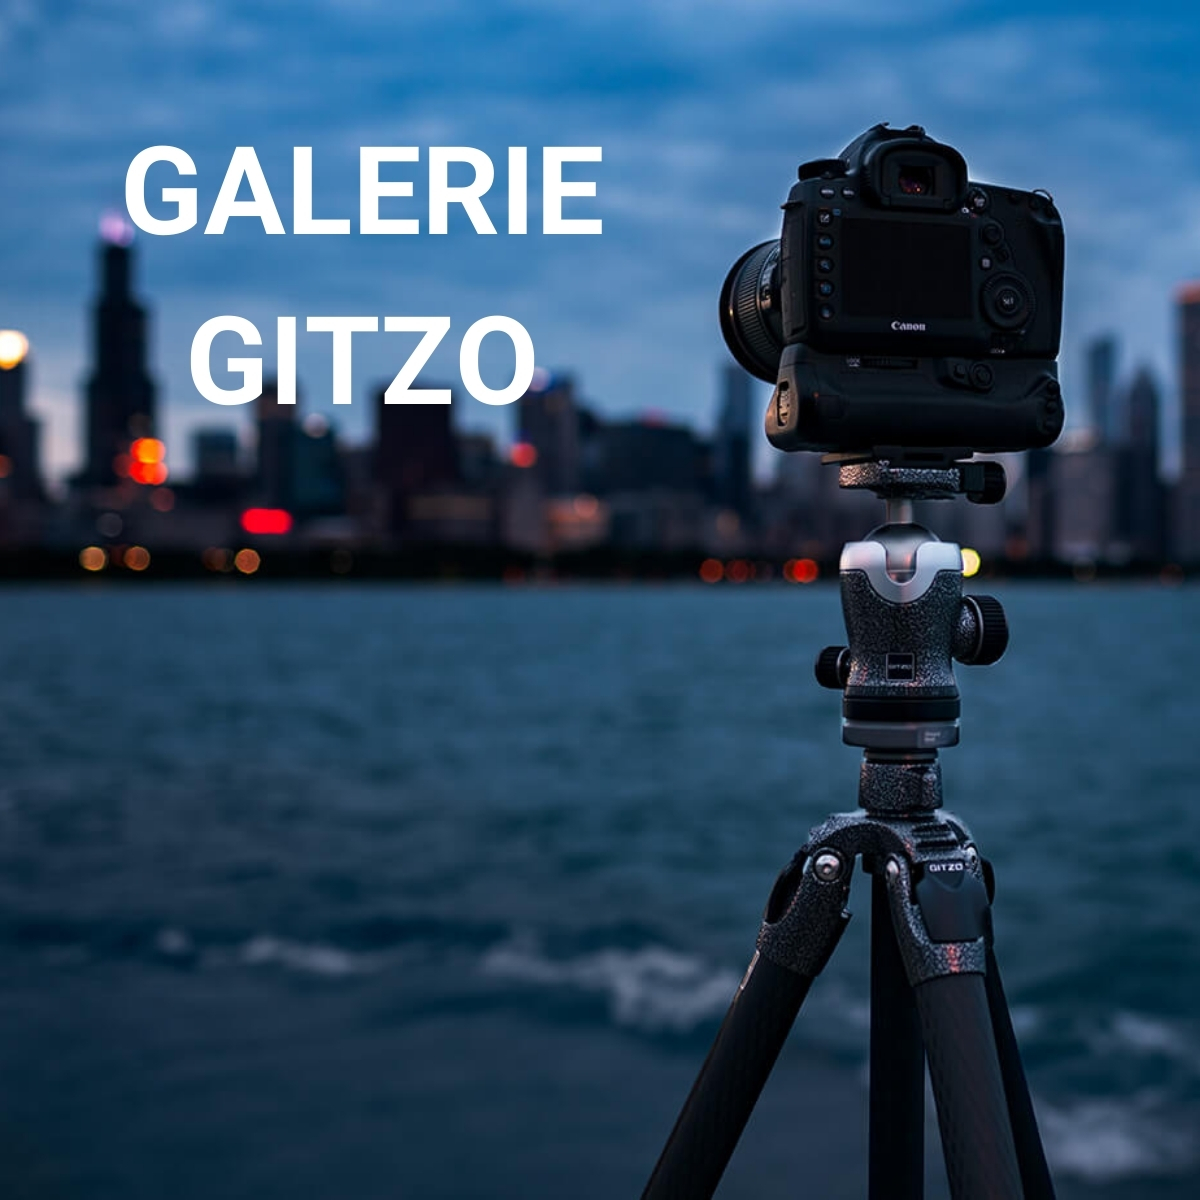 Galerie Gitzo